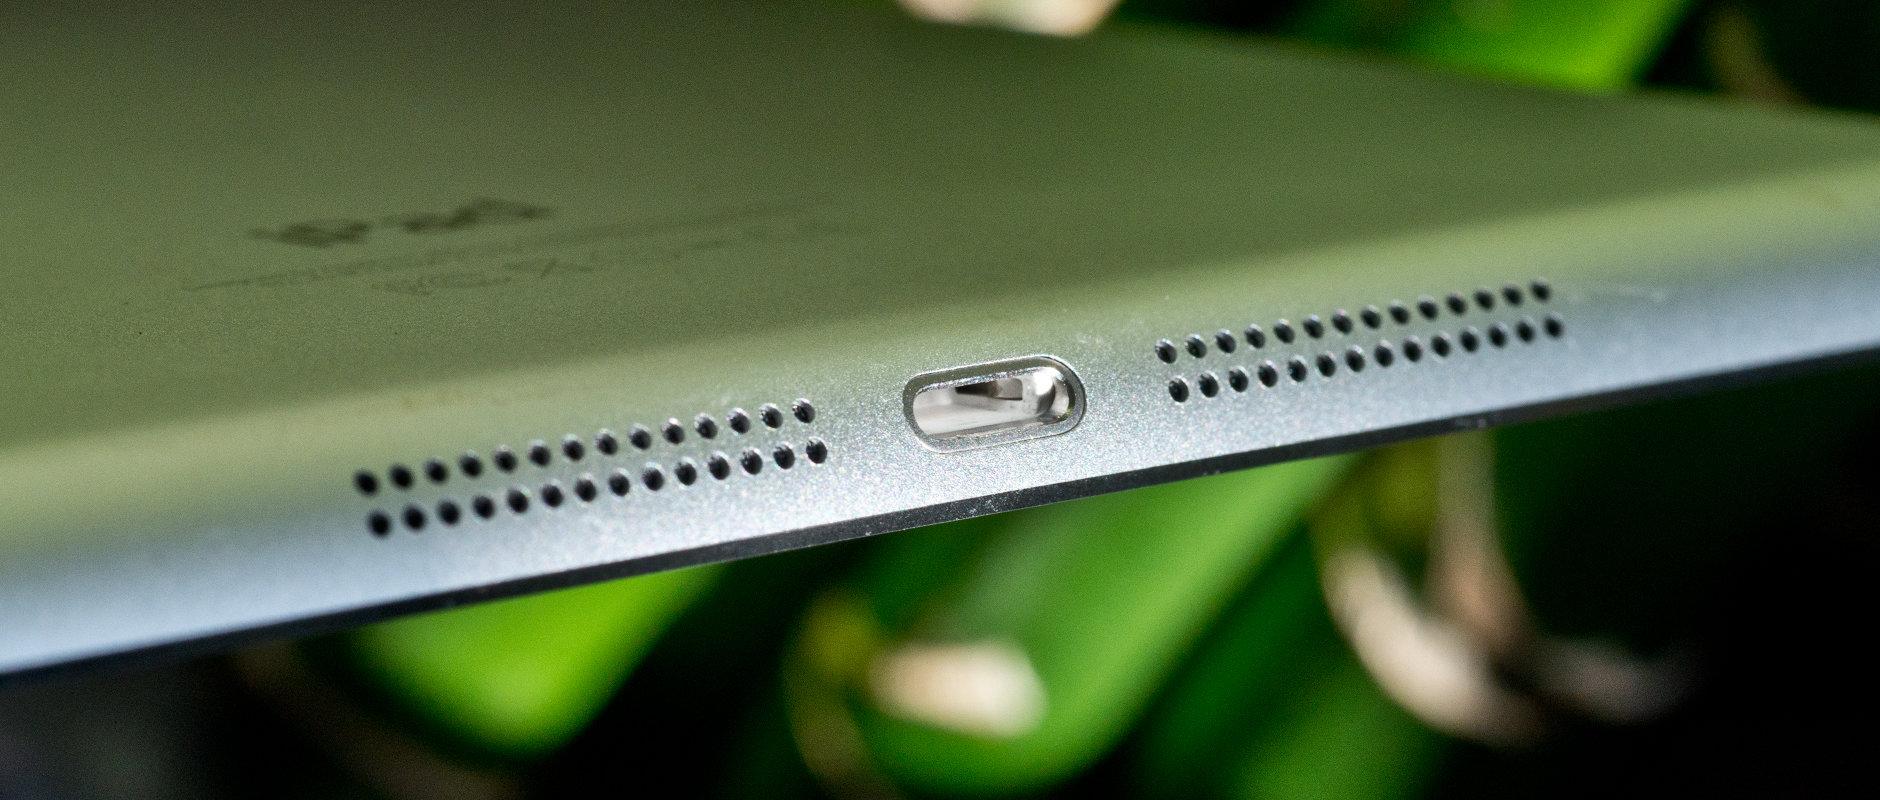 A photo of the Apple iPad mini 3's speakers.